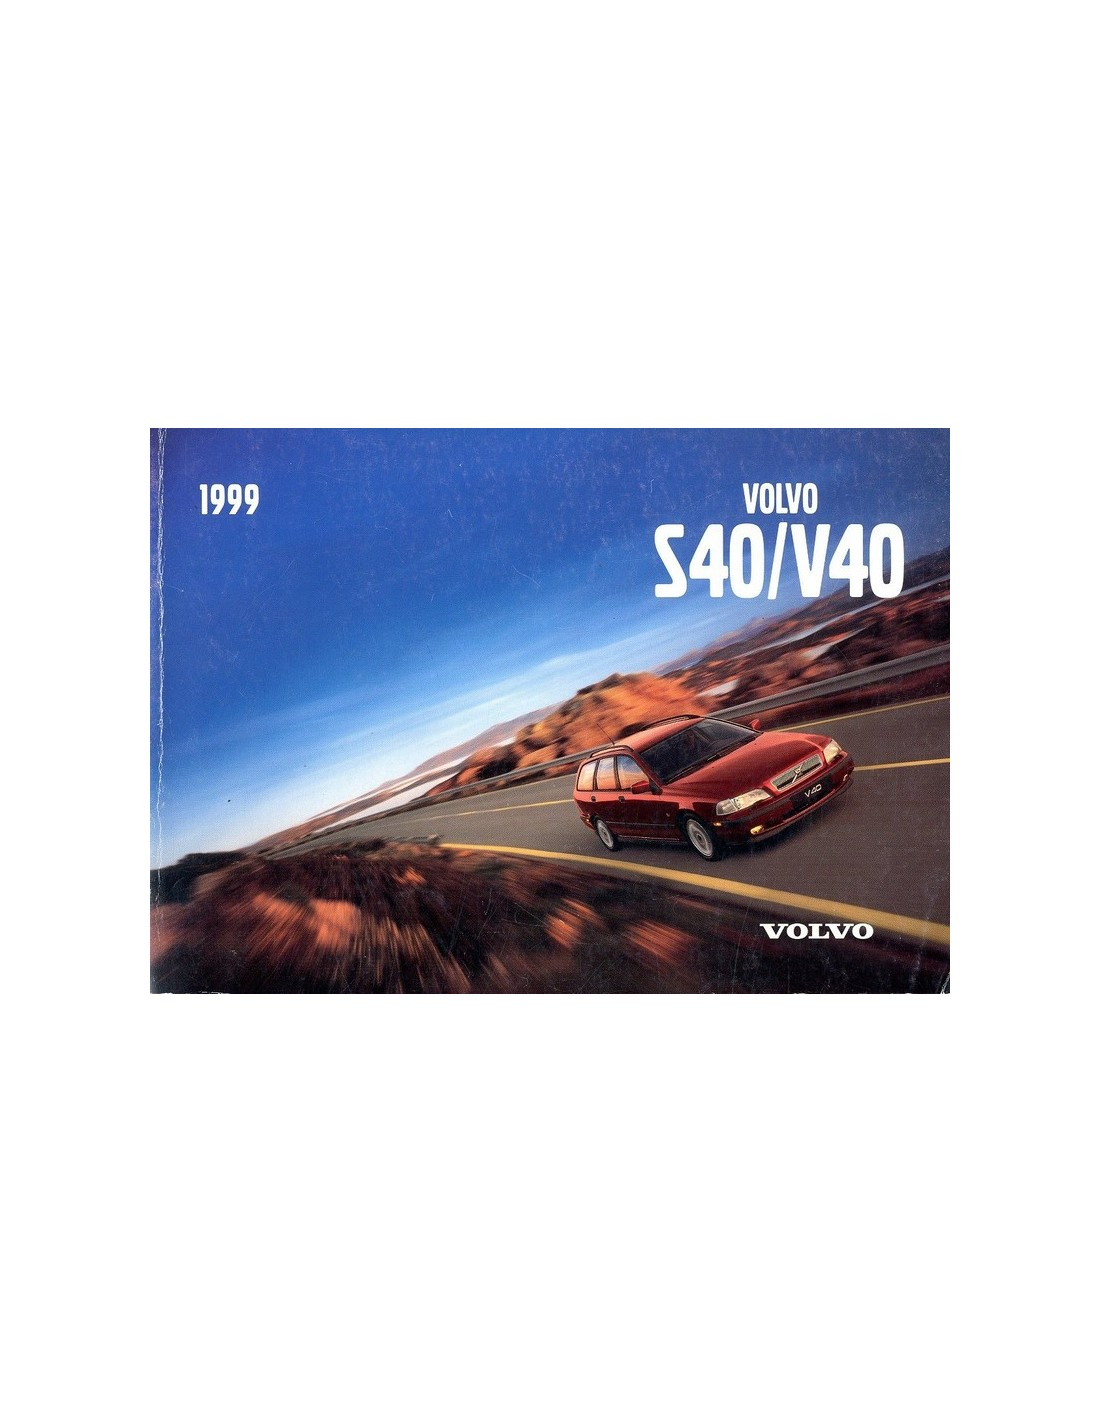 1999 volvo s40 v40 owner s manual english rh autolit eu 1999 volvo s40 owners manual pdf 2000 Volvo S40 Firing Order